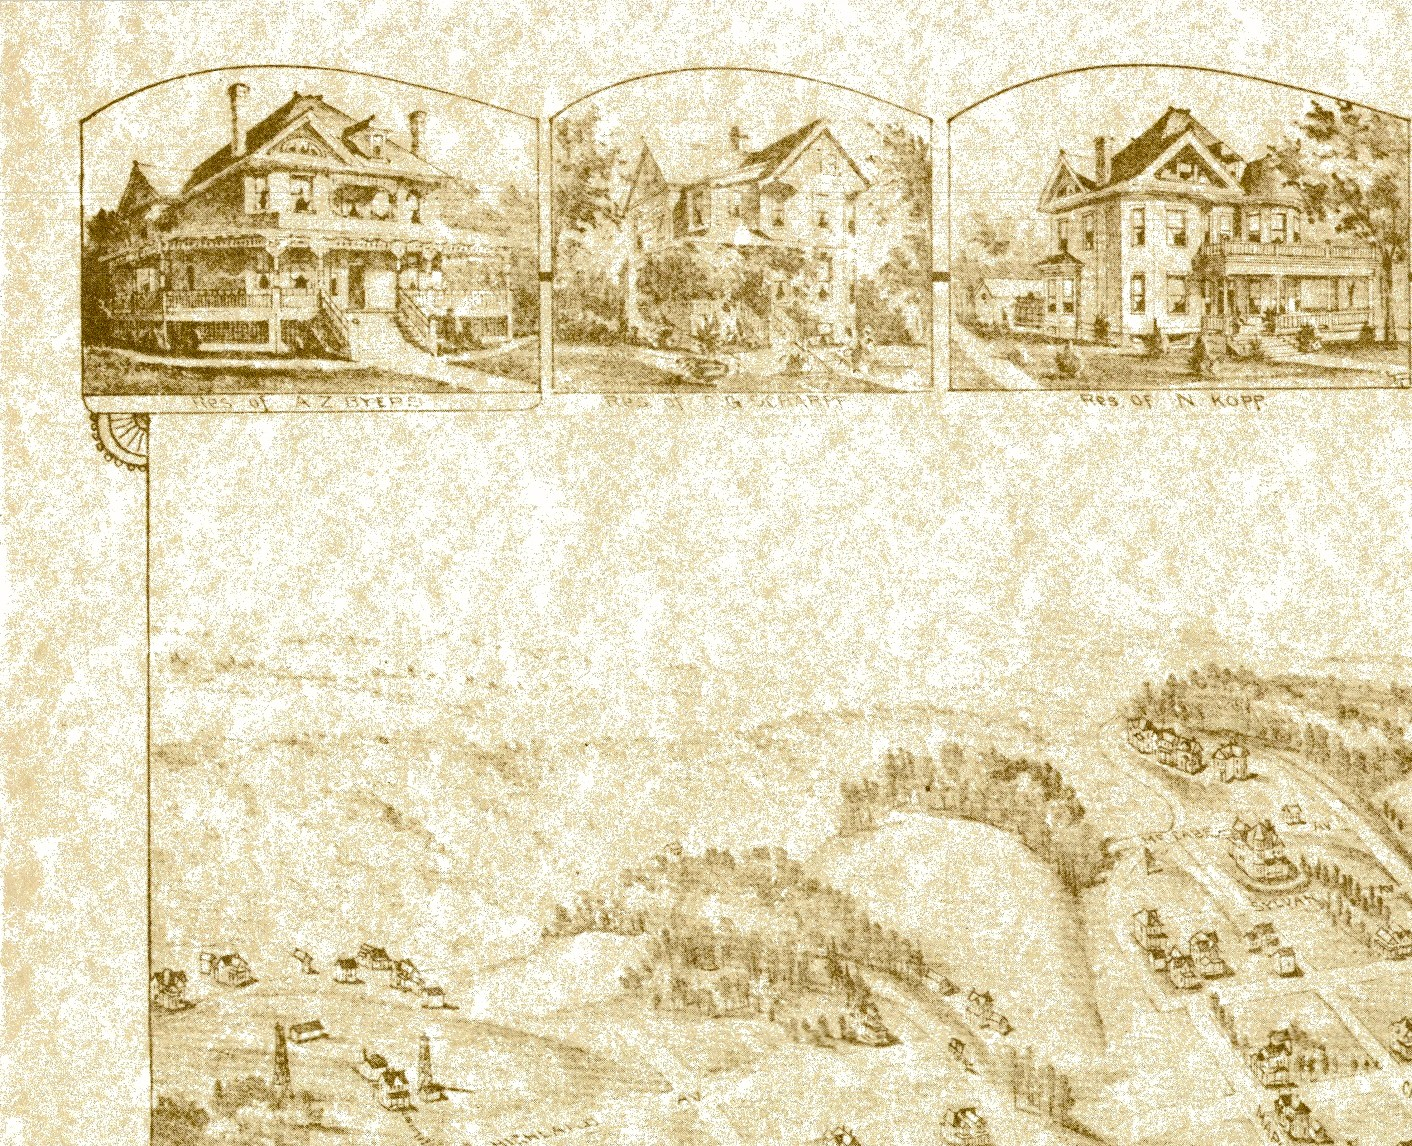 map-75(1A).jpg